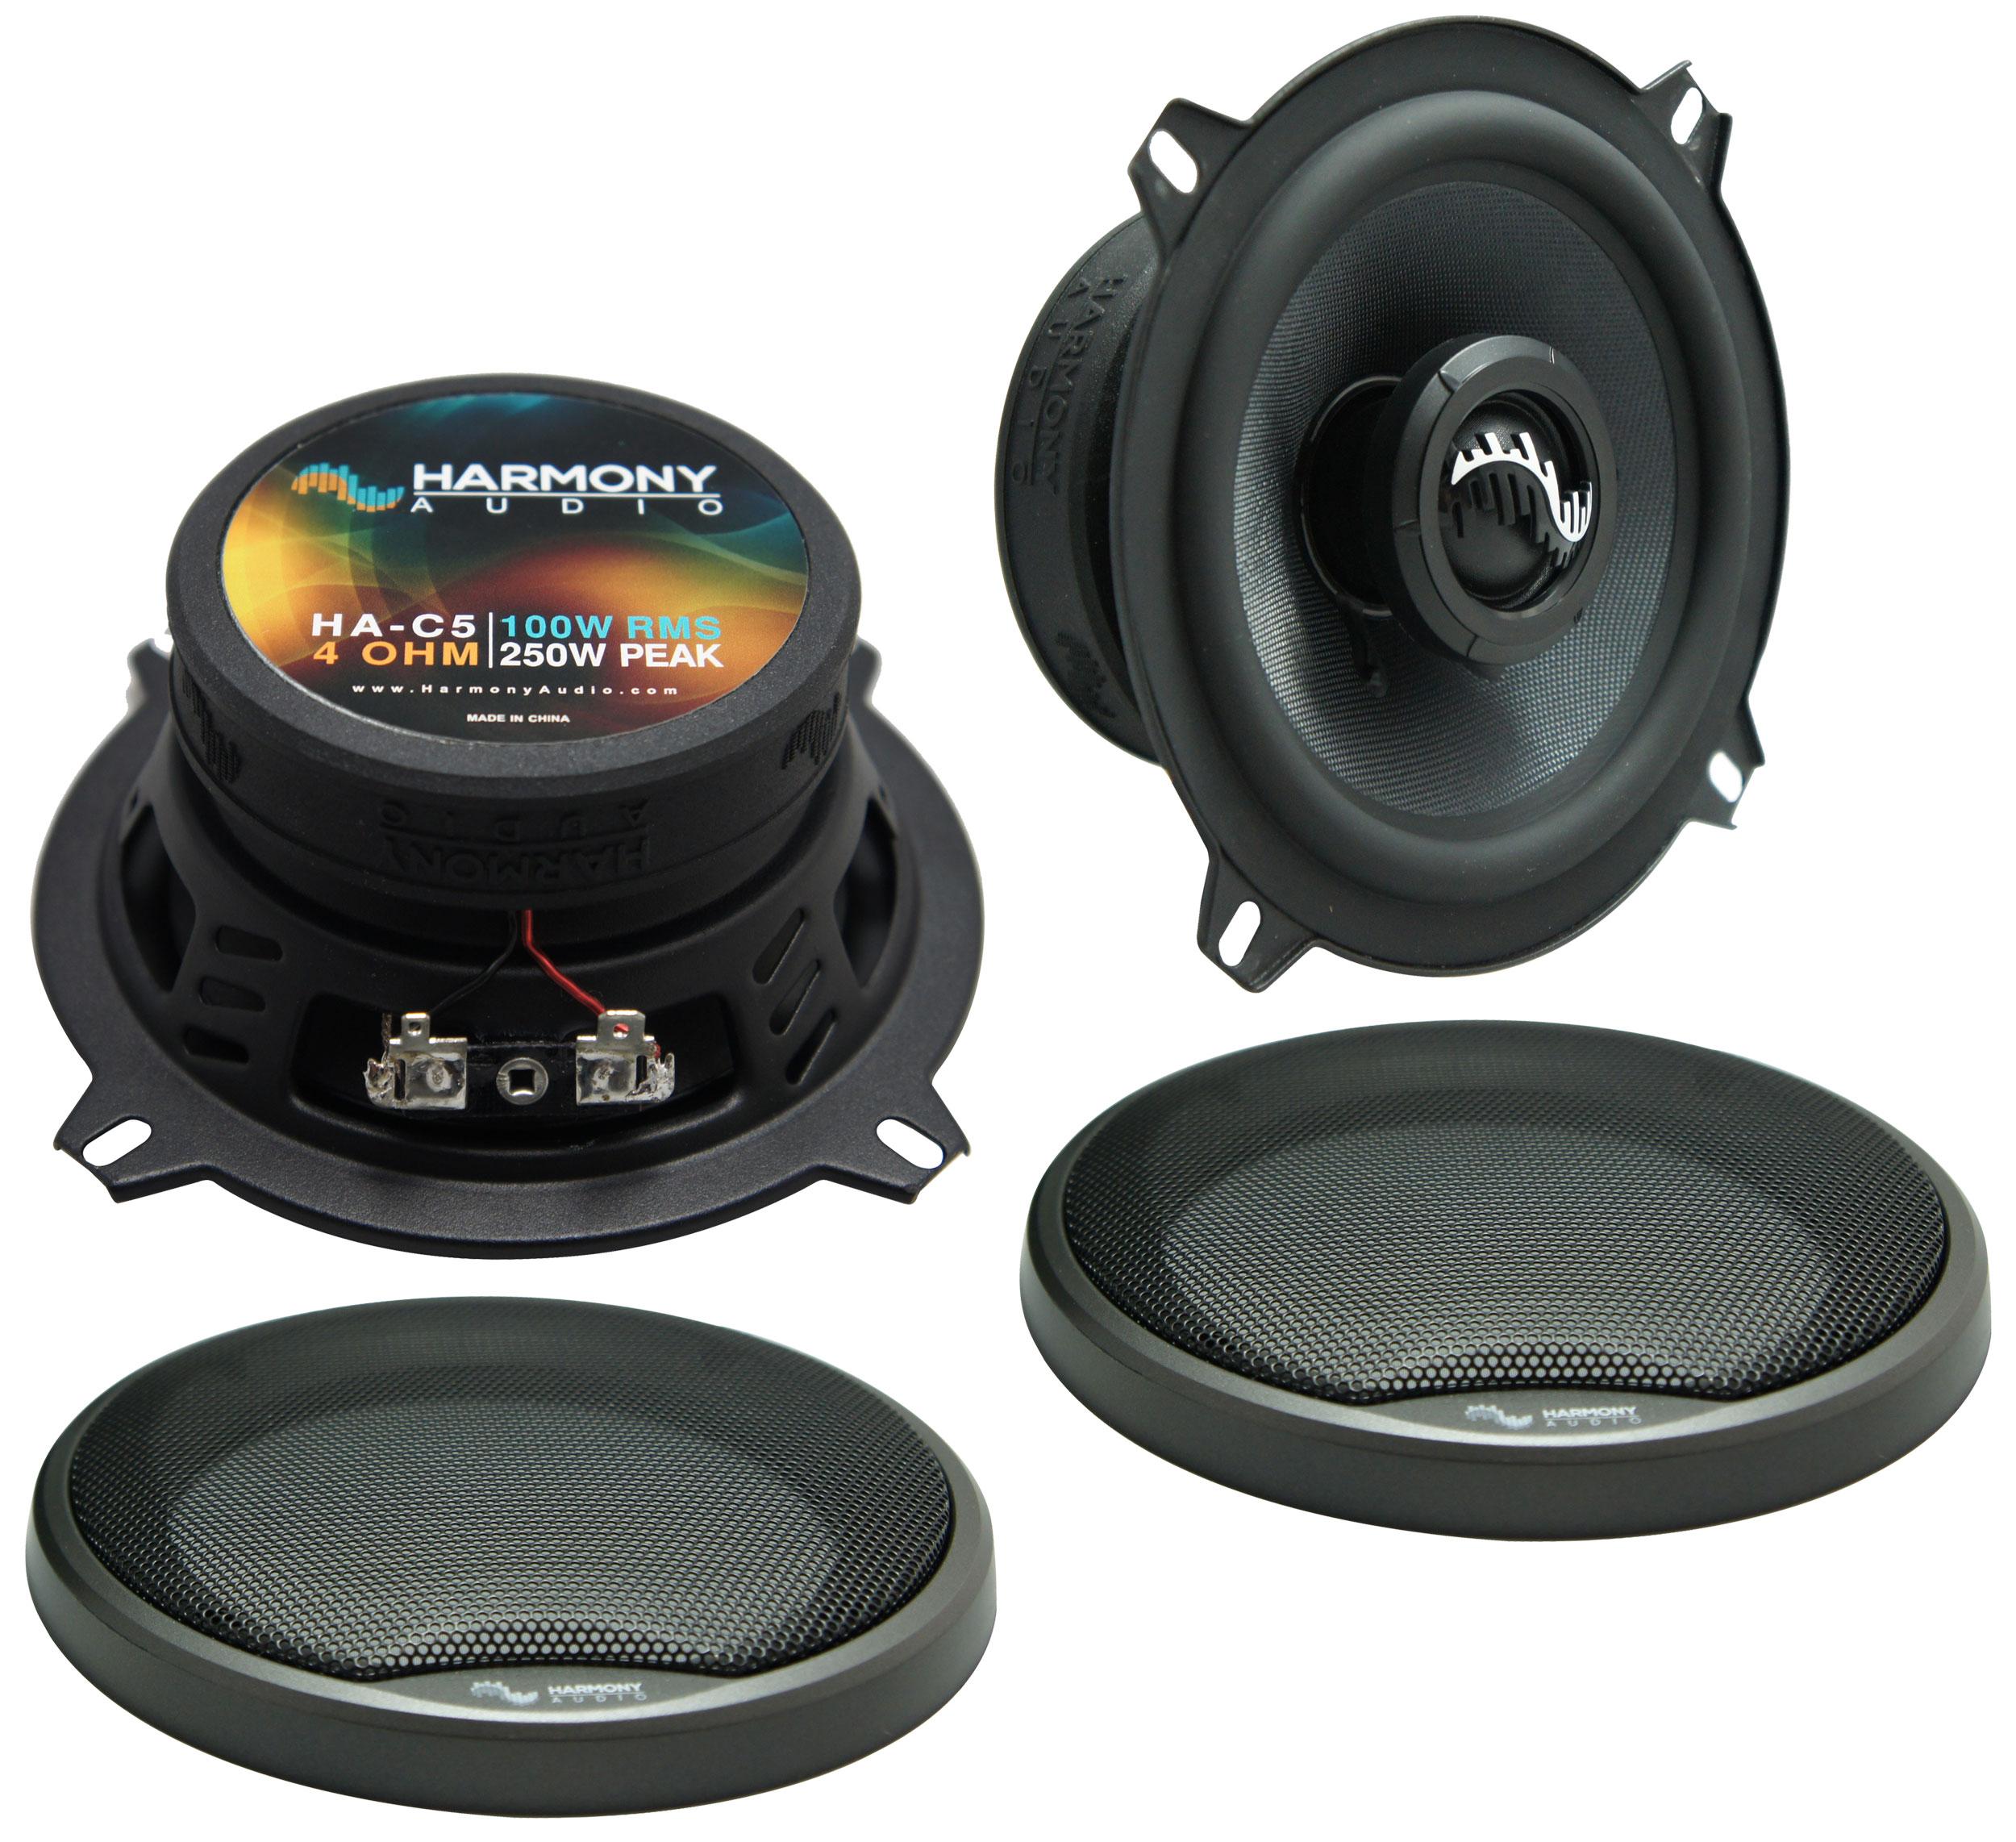 Fits Honda Civic 1986-1991 Factory Speaker Replacement Harmony C5 Premium Speakers New